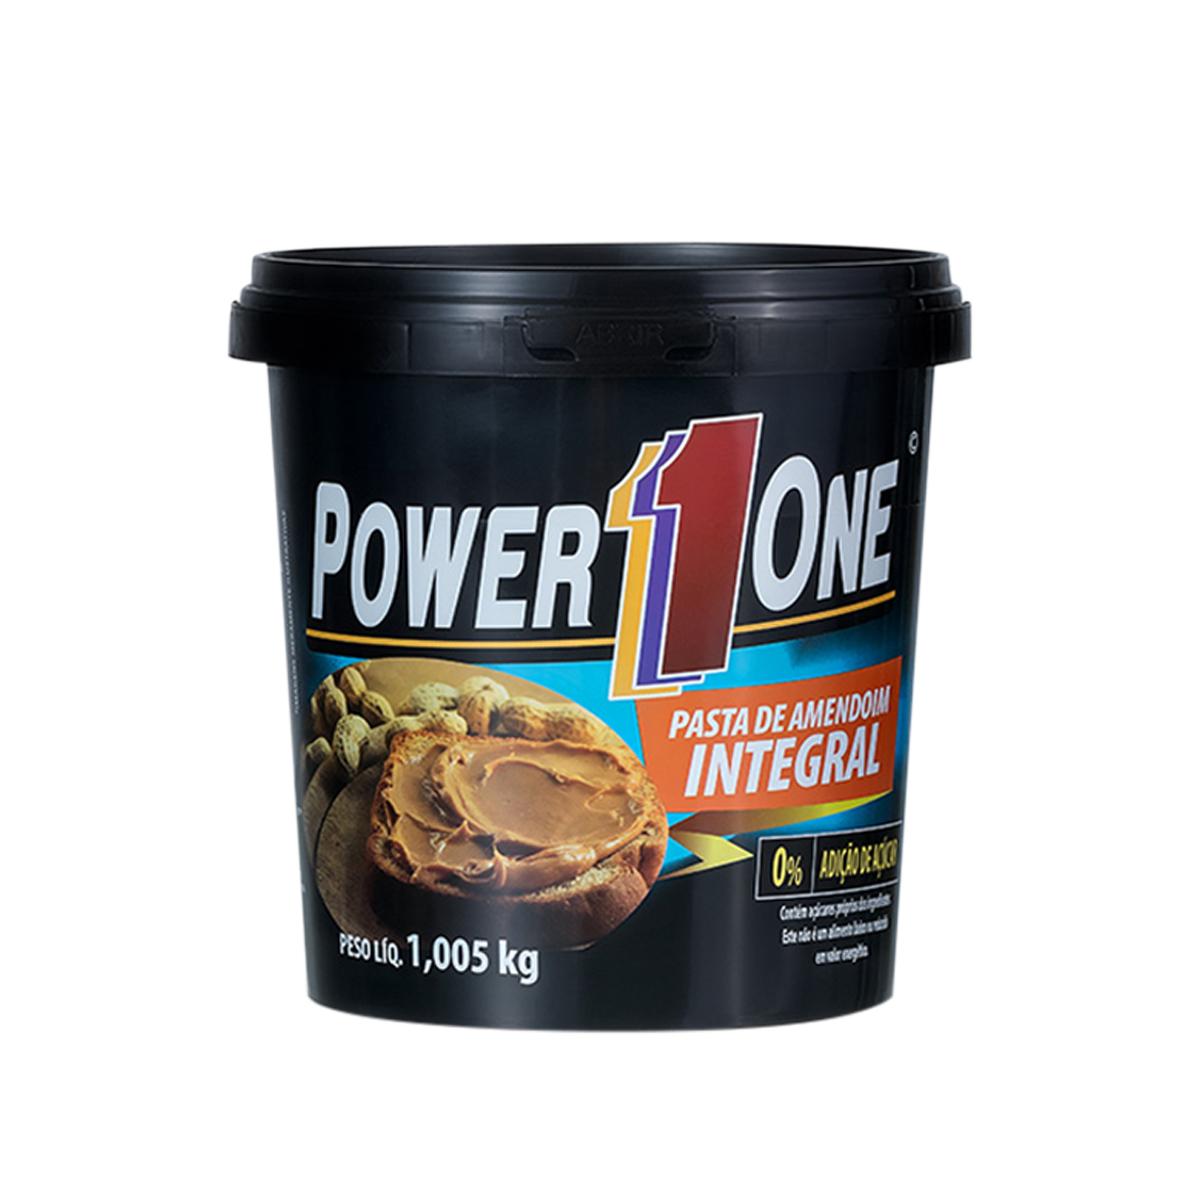 Pasta Amendoim Integral Zero 1,005kg - Power1One